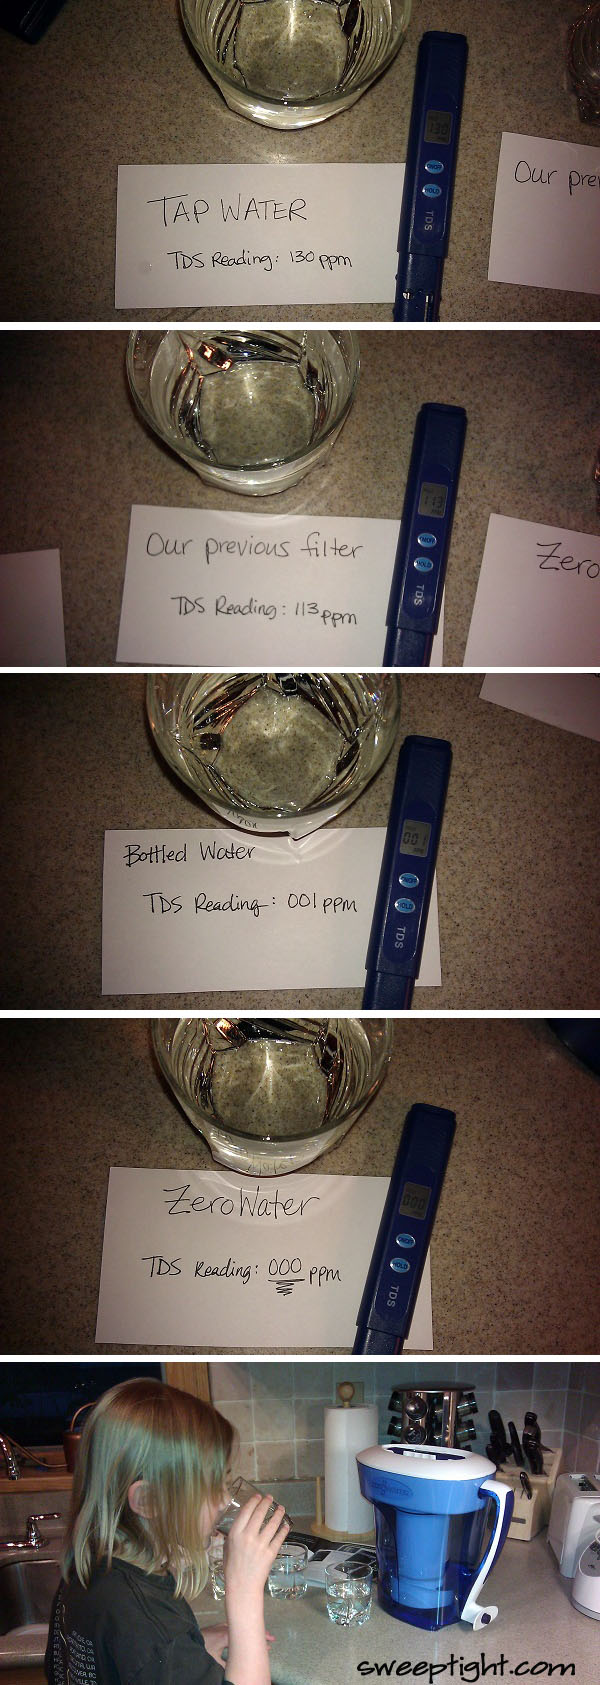 Clean drinking water test